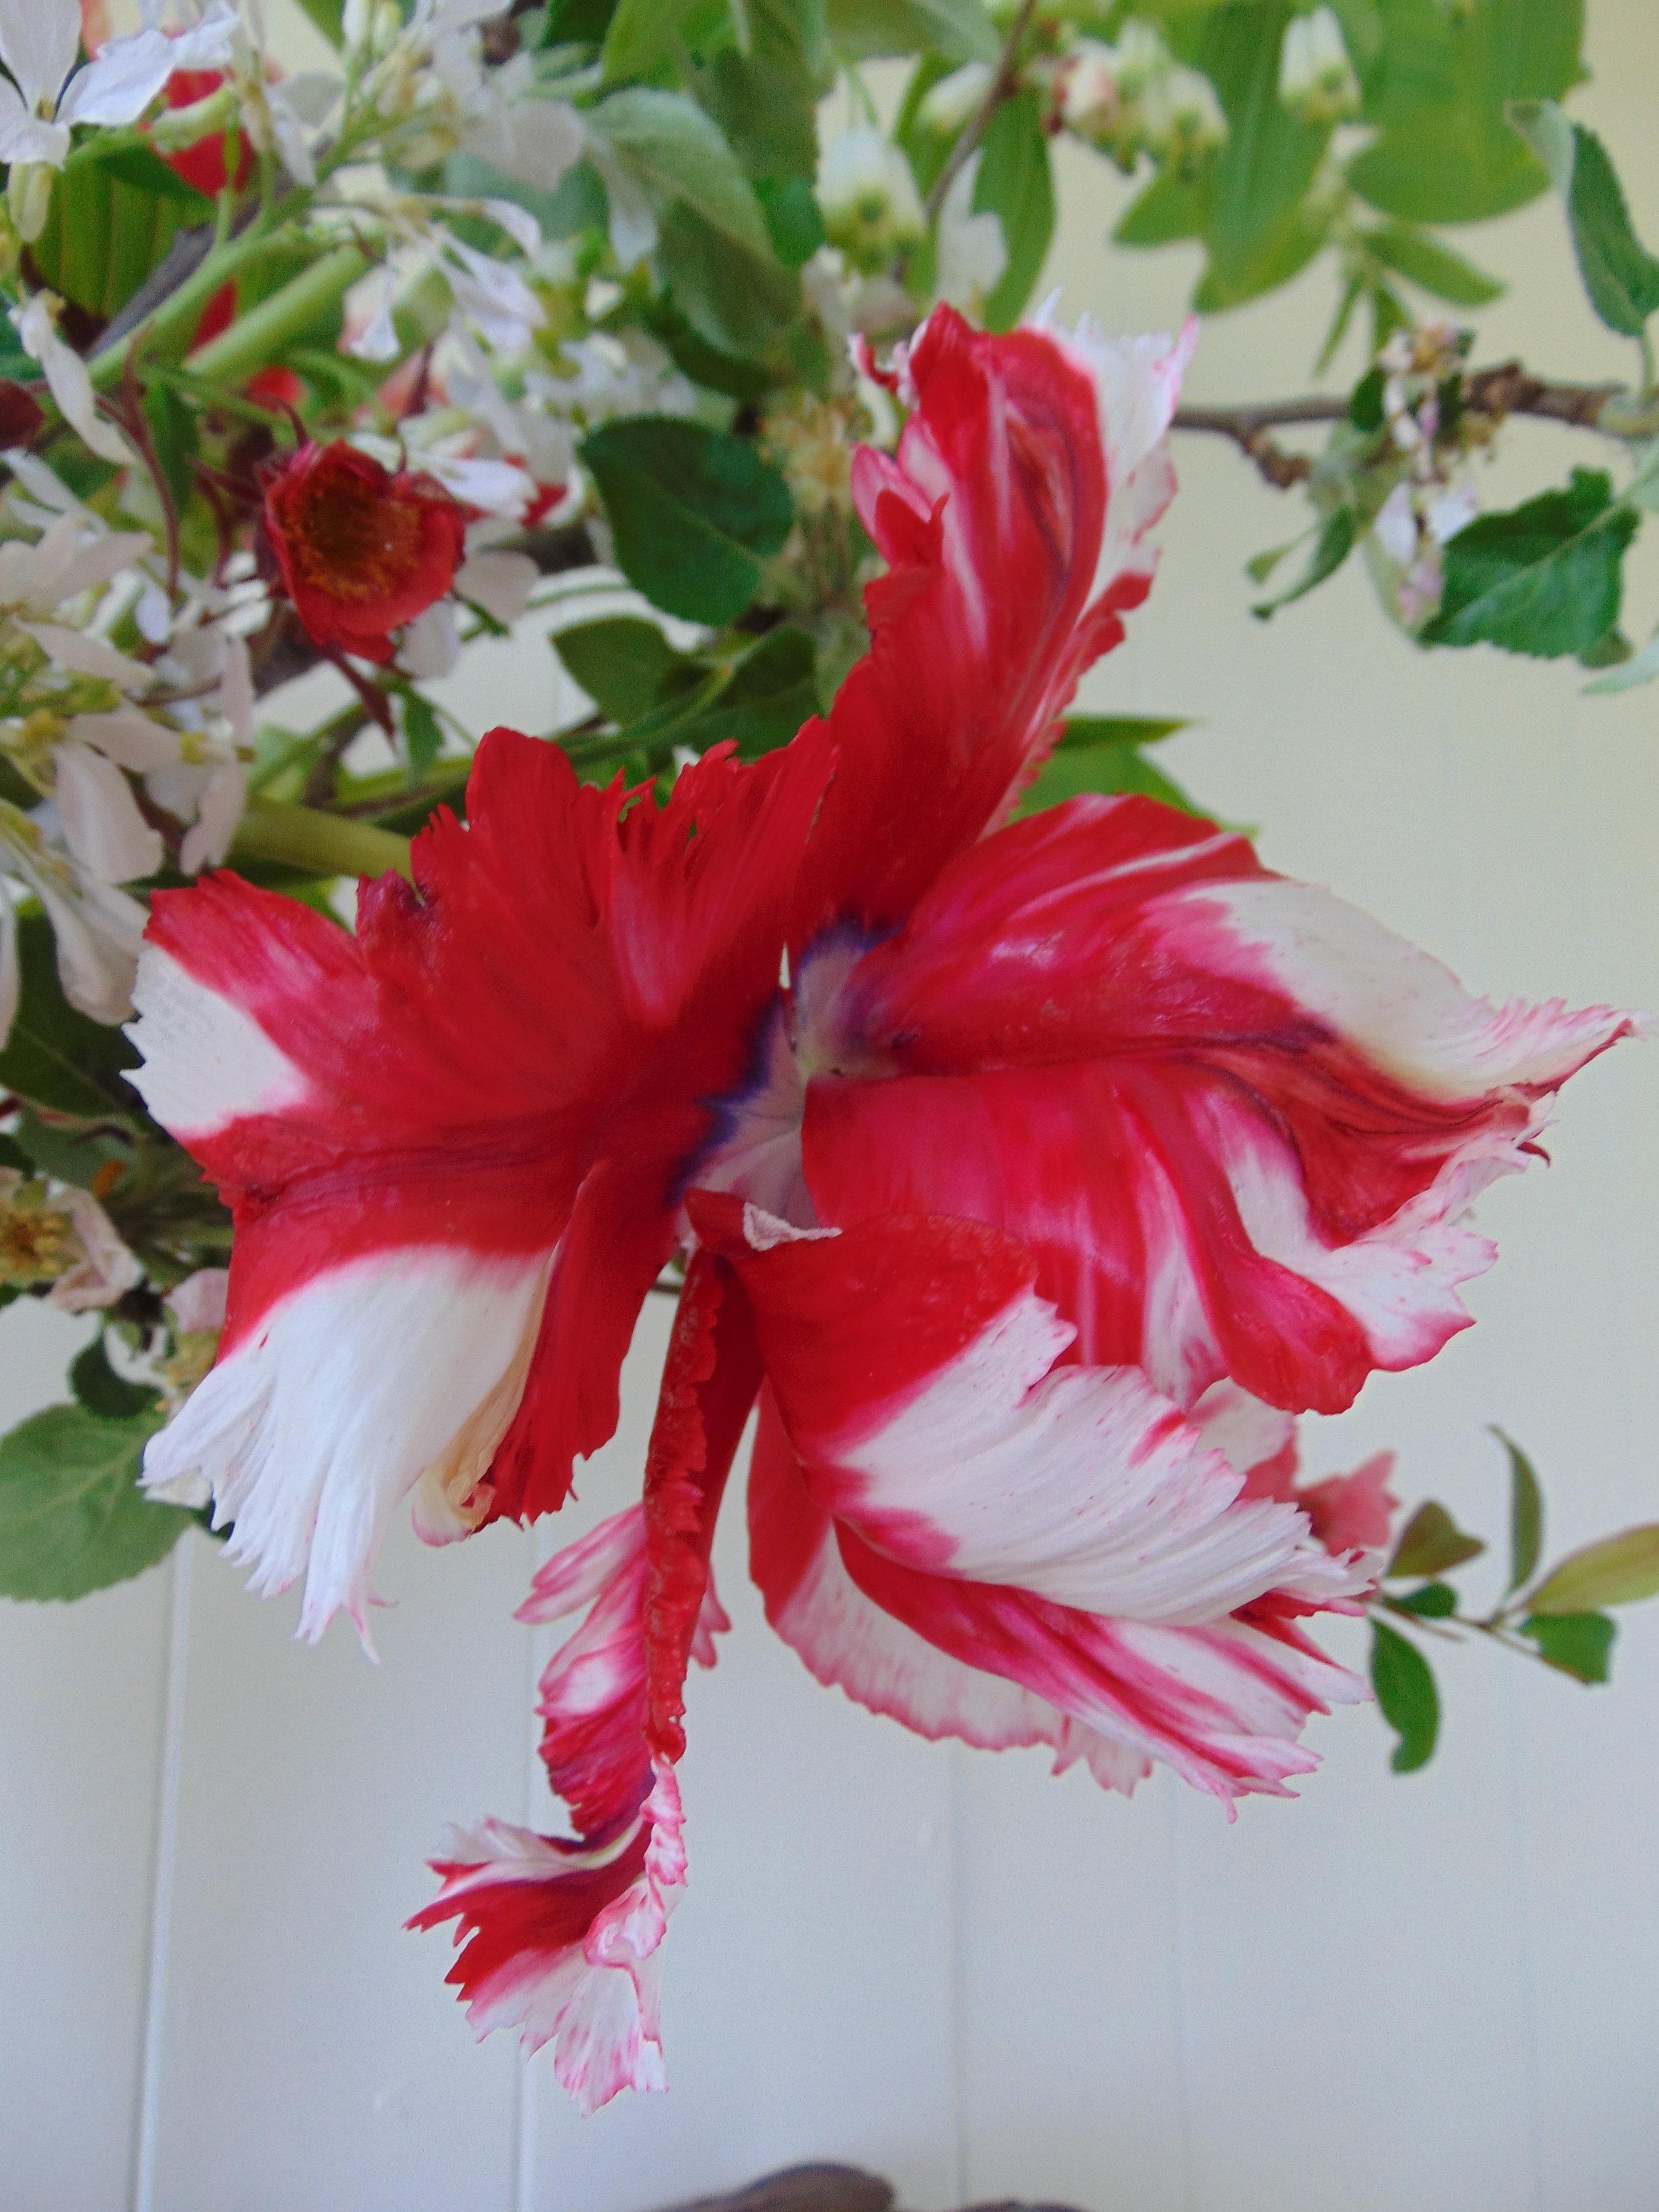 Tulipa 'Estella Rynvald' grown by Hedgerow Flower Company, Nova Scotia